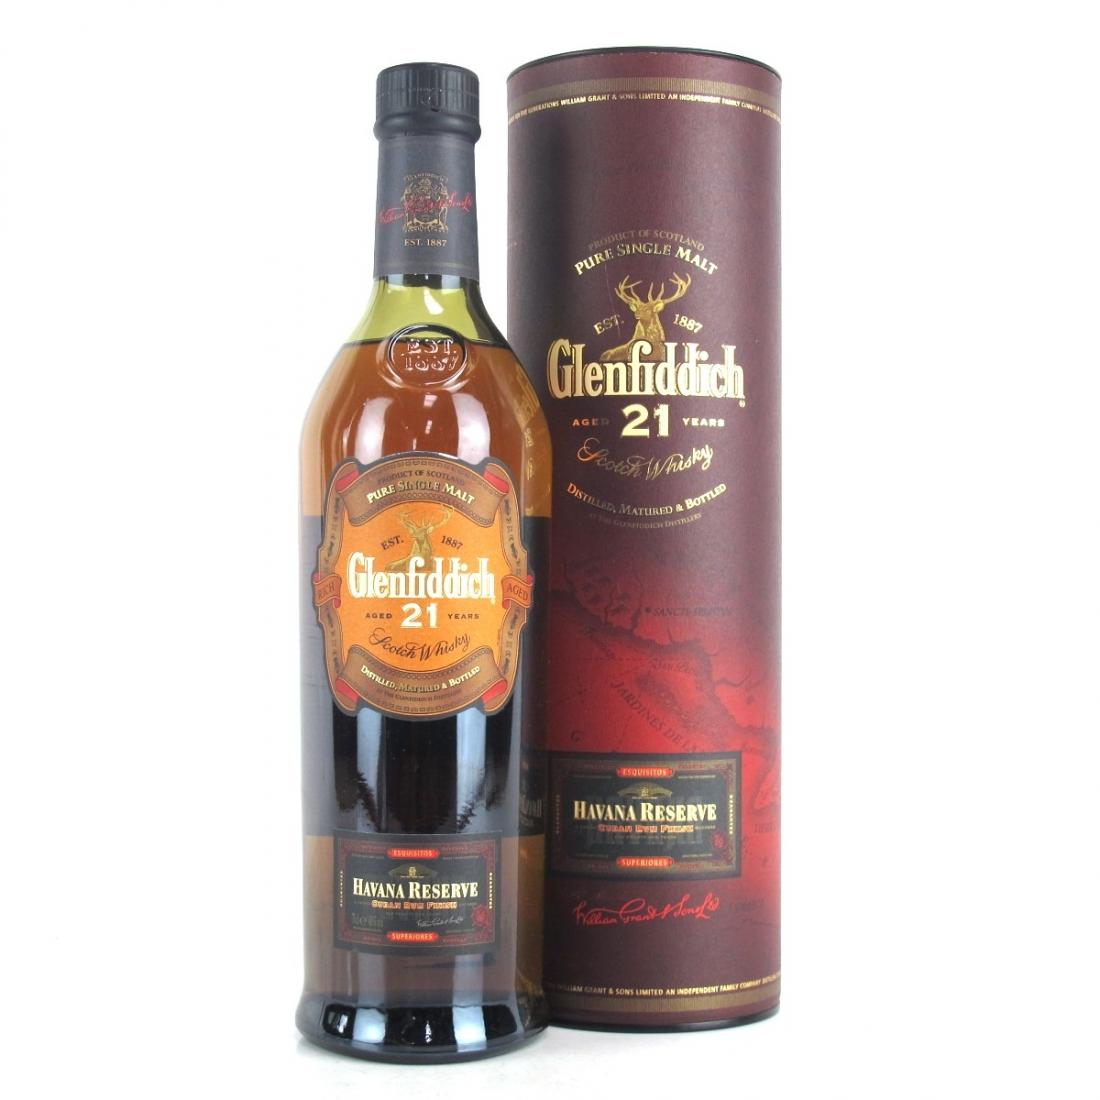 Glenfiddich 21 Year Old Havana Reserve